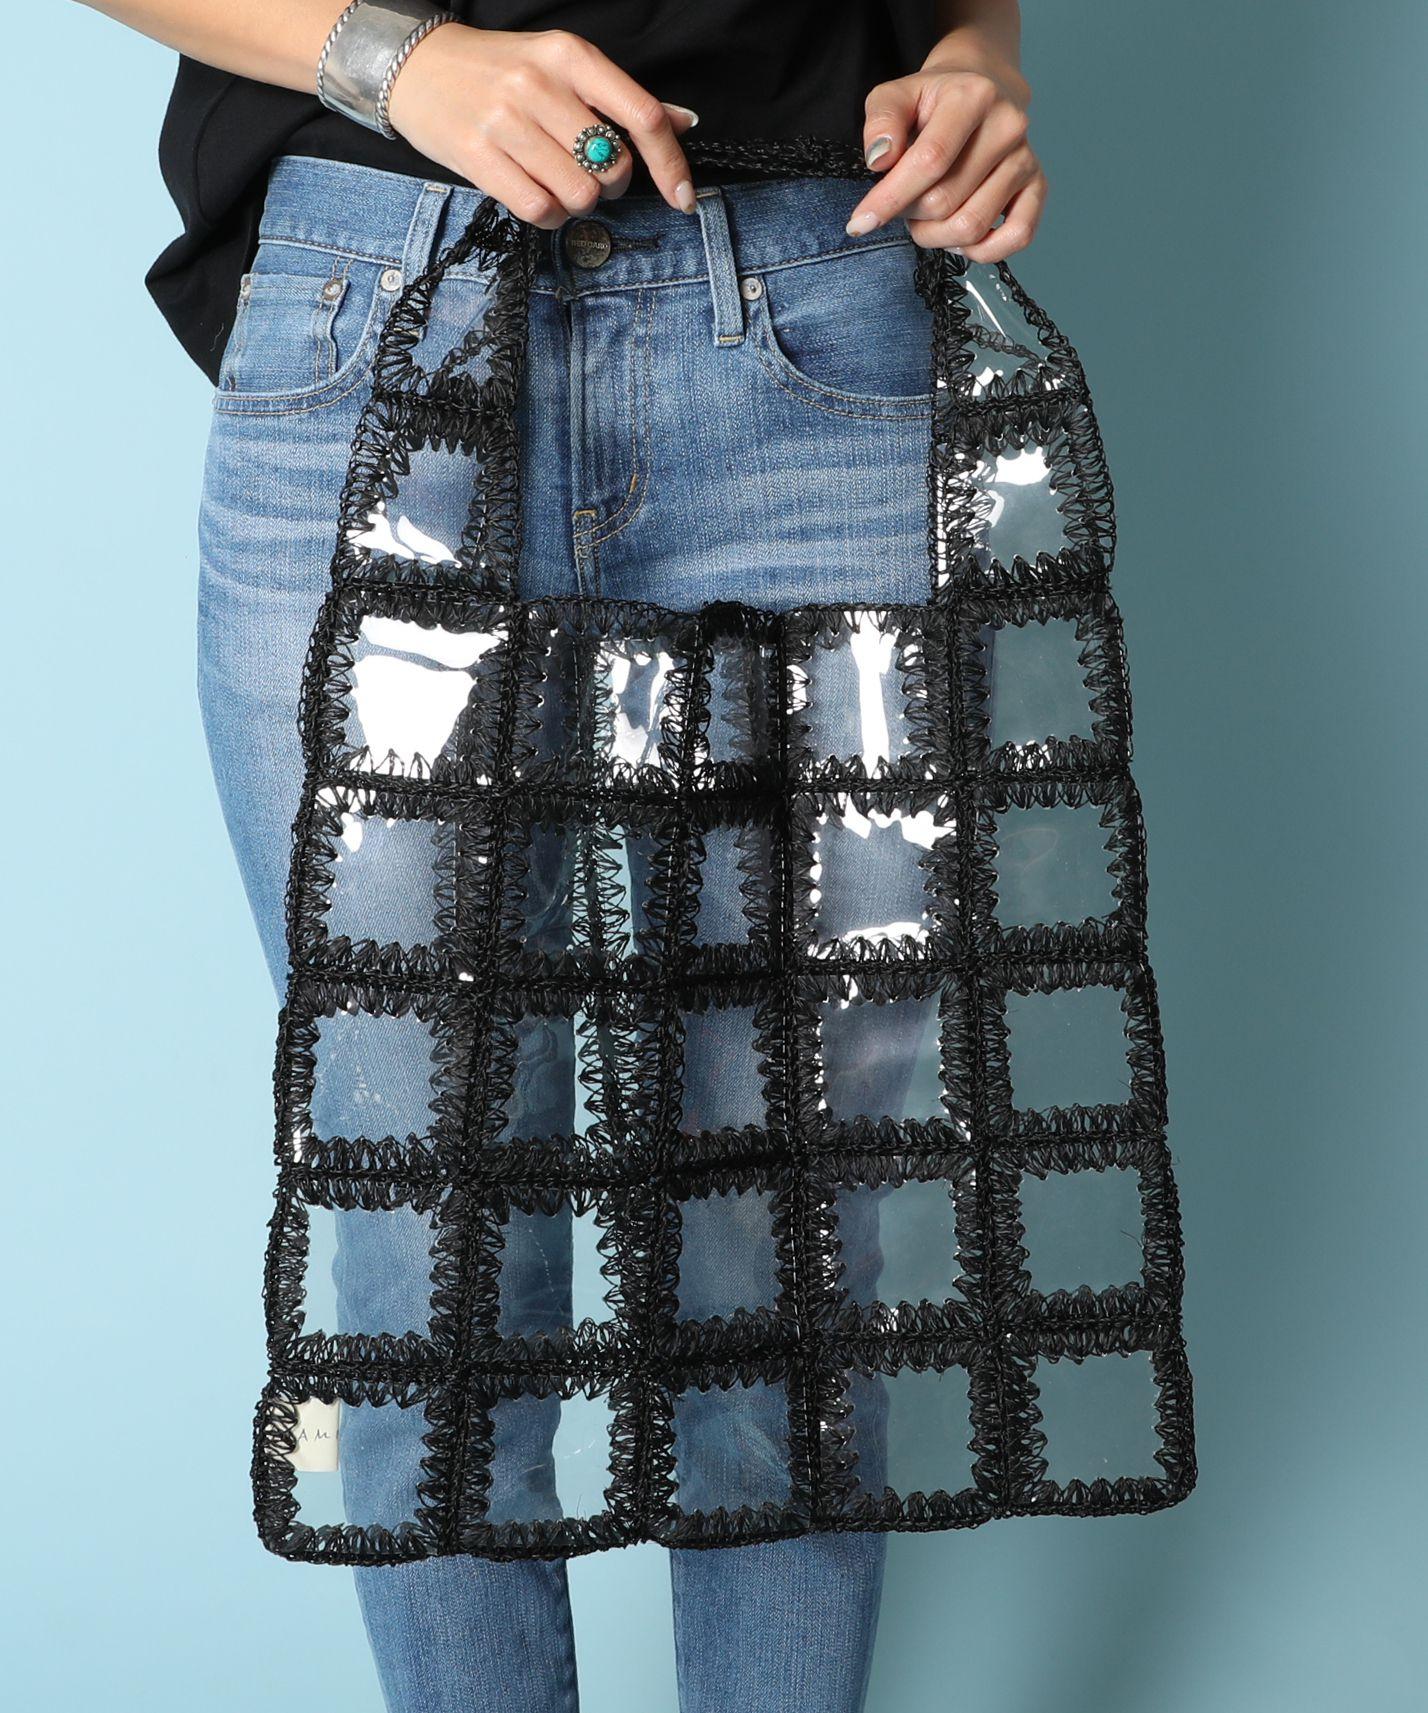 JAMIRAY ジャミレイ / PVCクリアトートバッグ Clear Patch Shopper